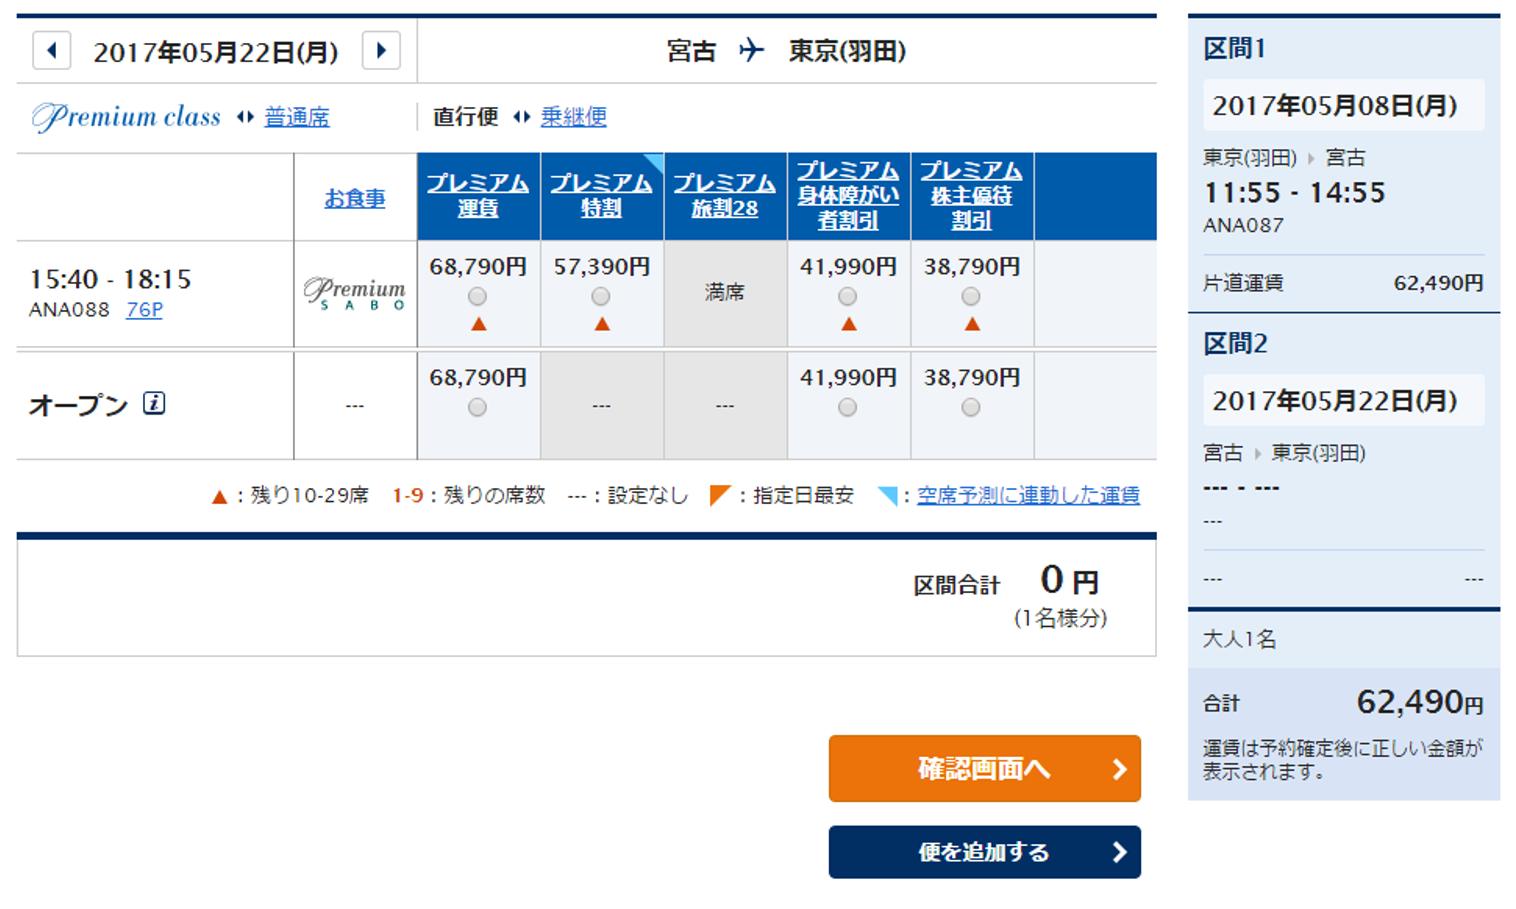 [ANA SFC修行]国内線プレミアムクラスを発売開始日(搭乗日二か月前)より2週間早く押さえる方法